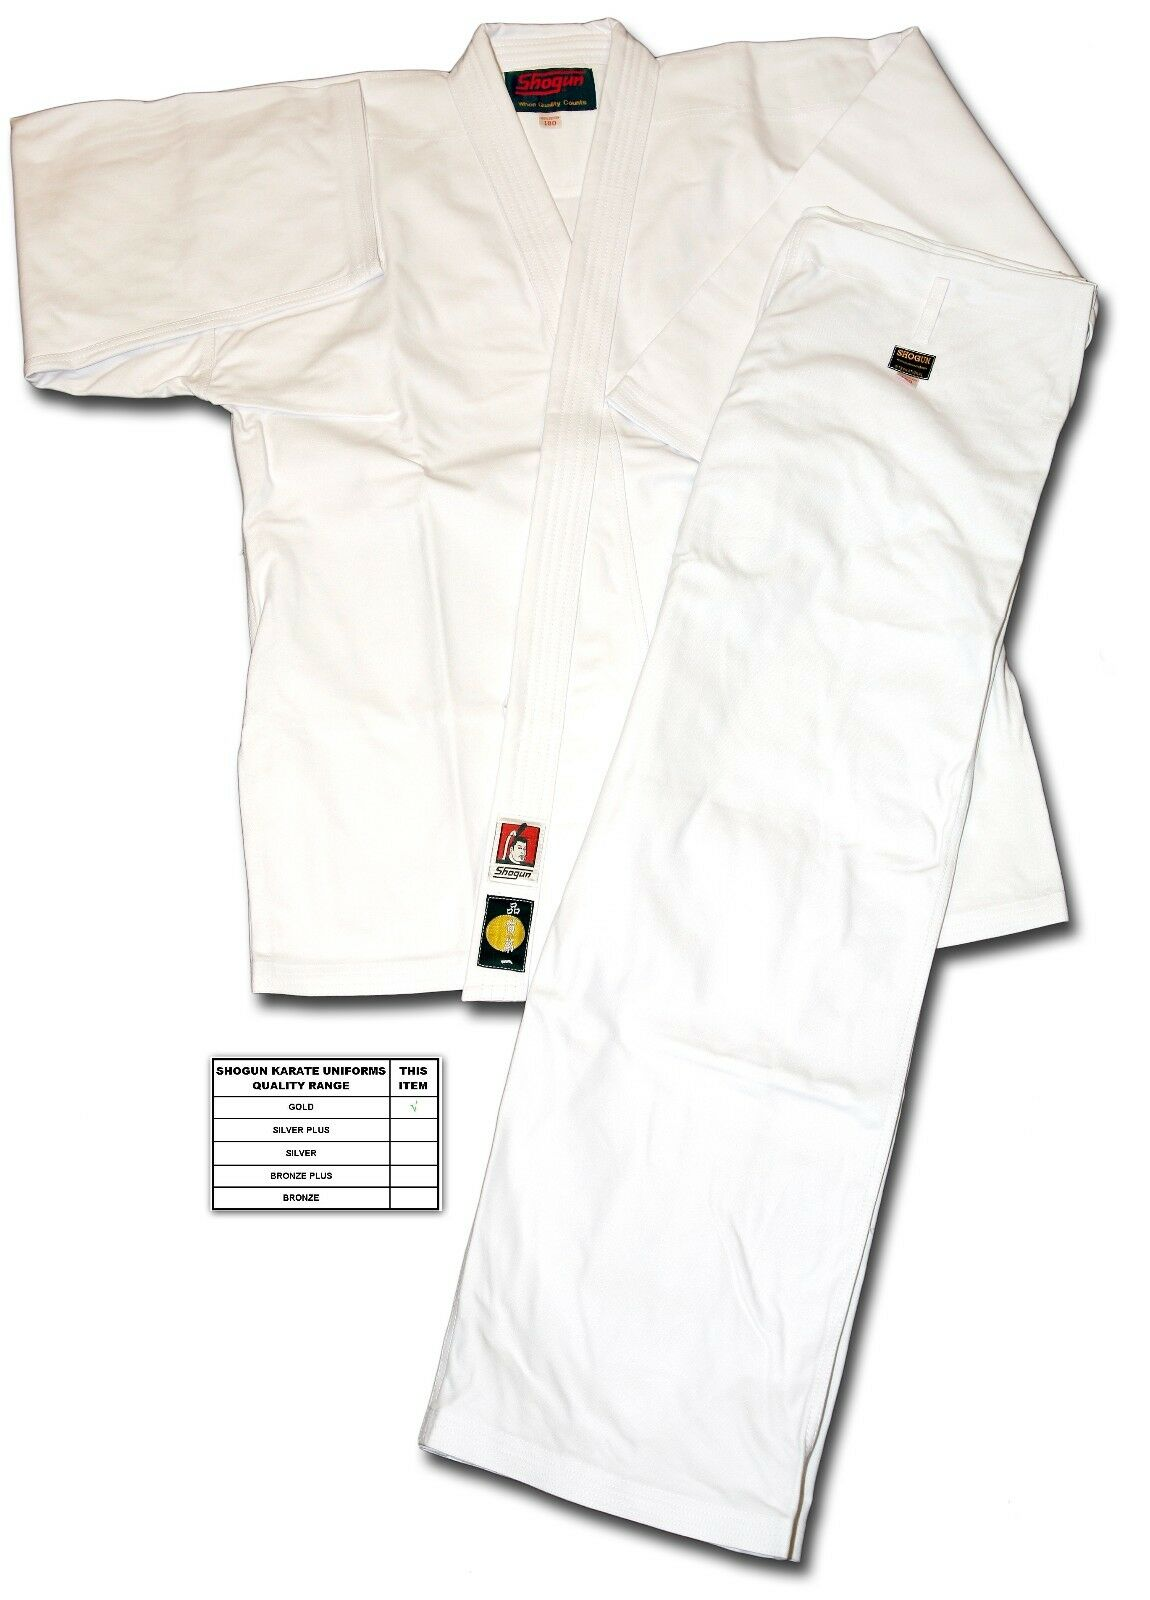 Shogun Karate gold Uniform size 155, 100% fine quality cotton - SPECIAL OFFER